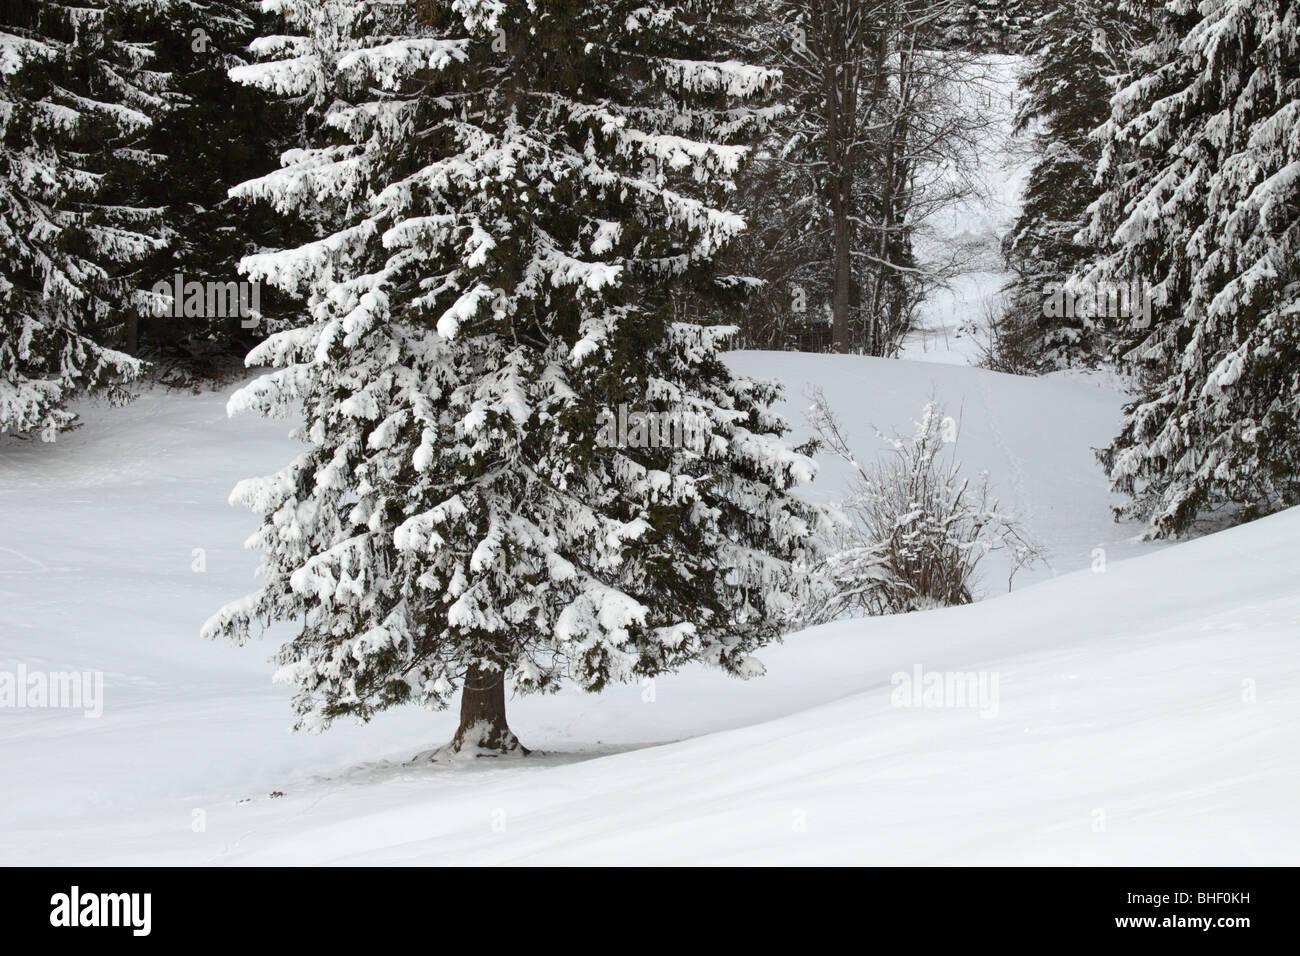 Firs in the snow. Alps near Garmisch-Partenkirchen, Bavaria, Germany - Stock Image